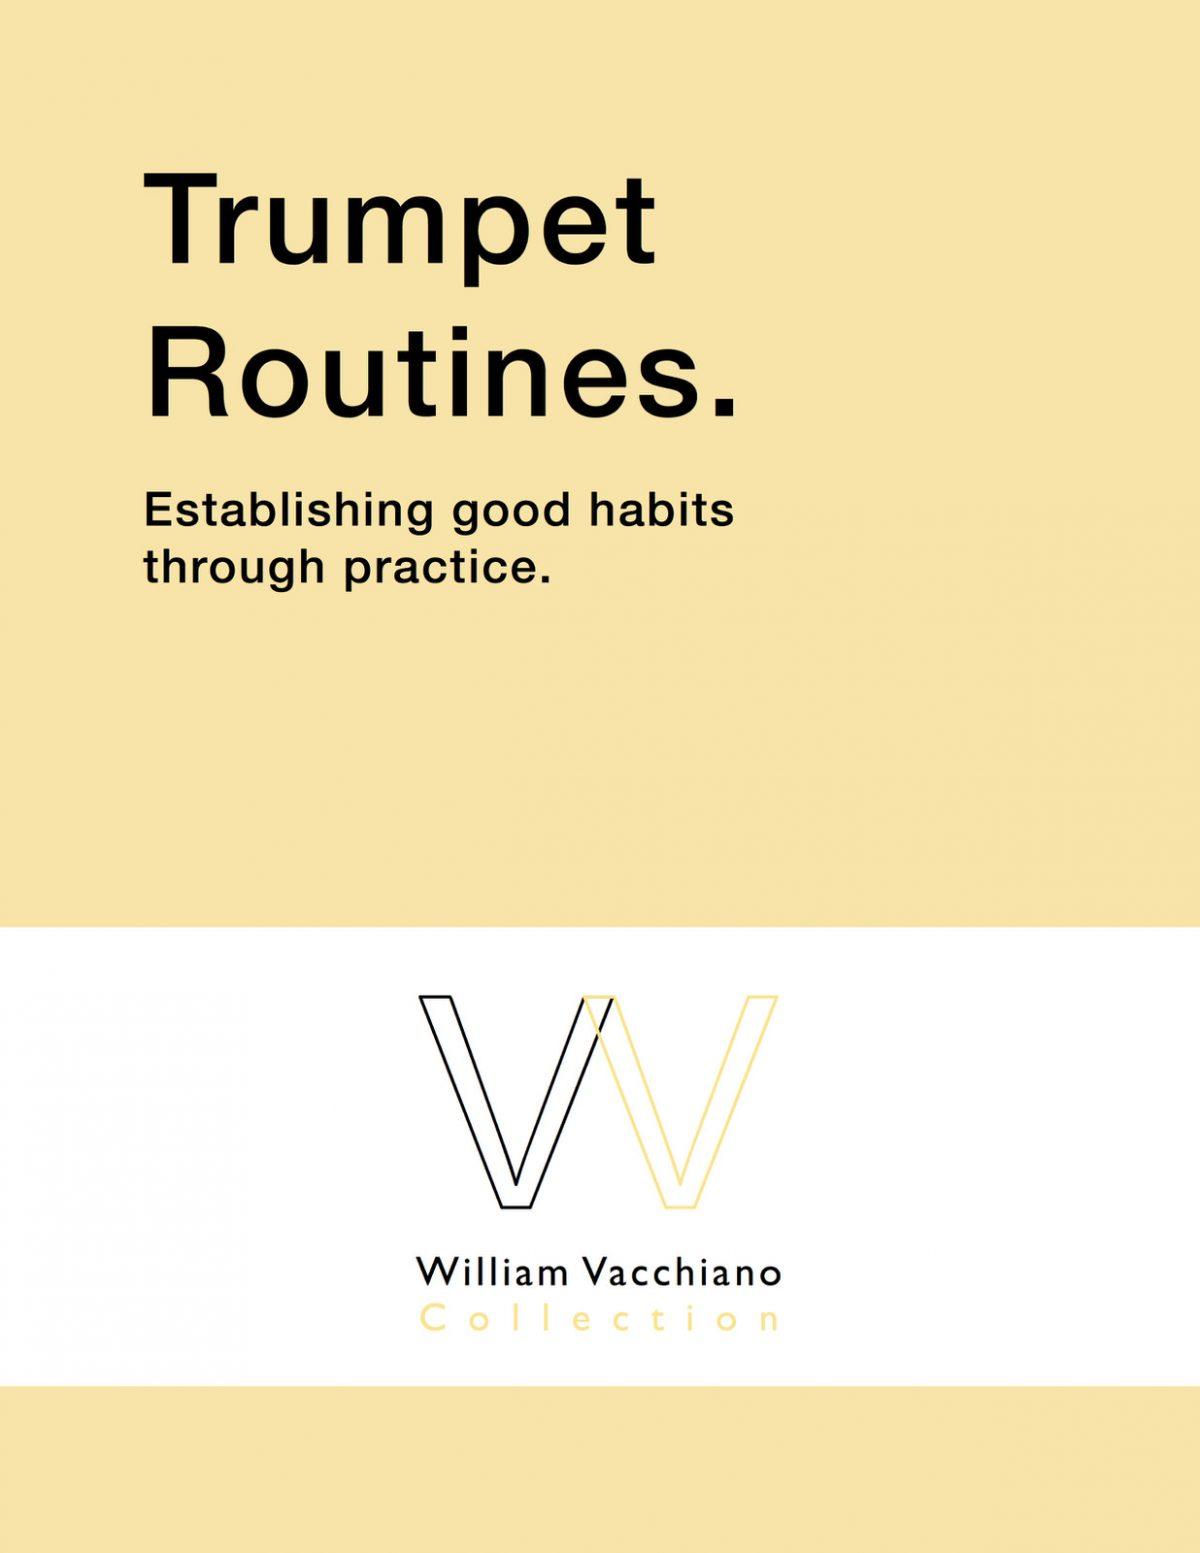 Vacchiano, Trumpet Routines